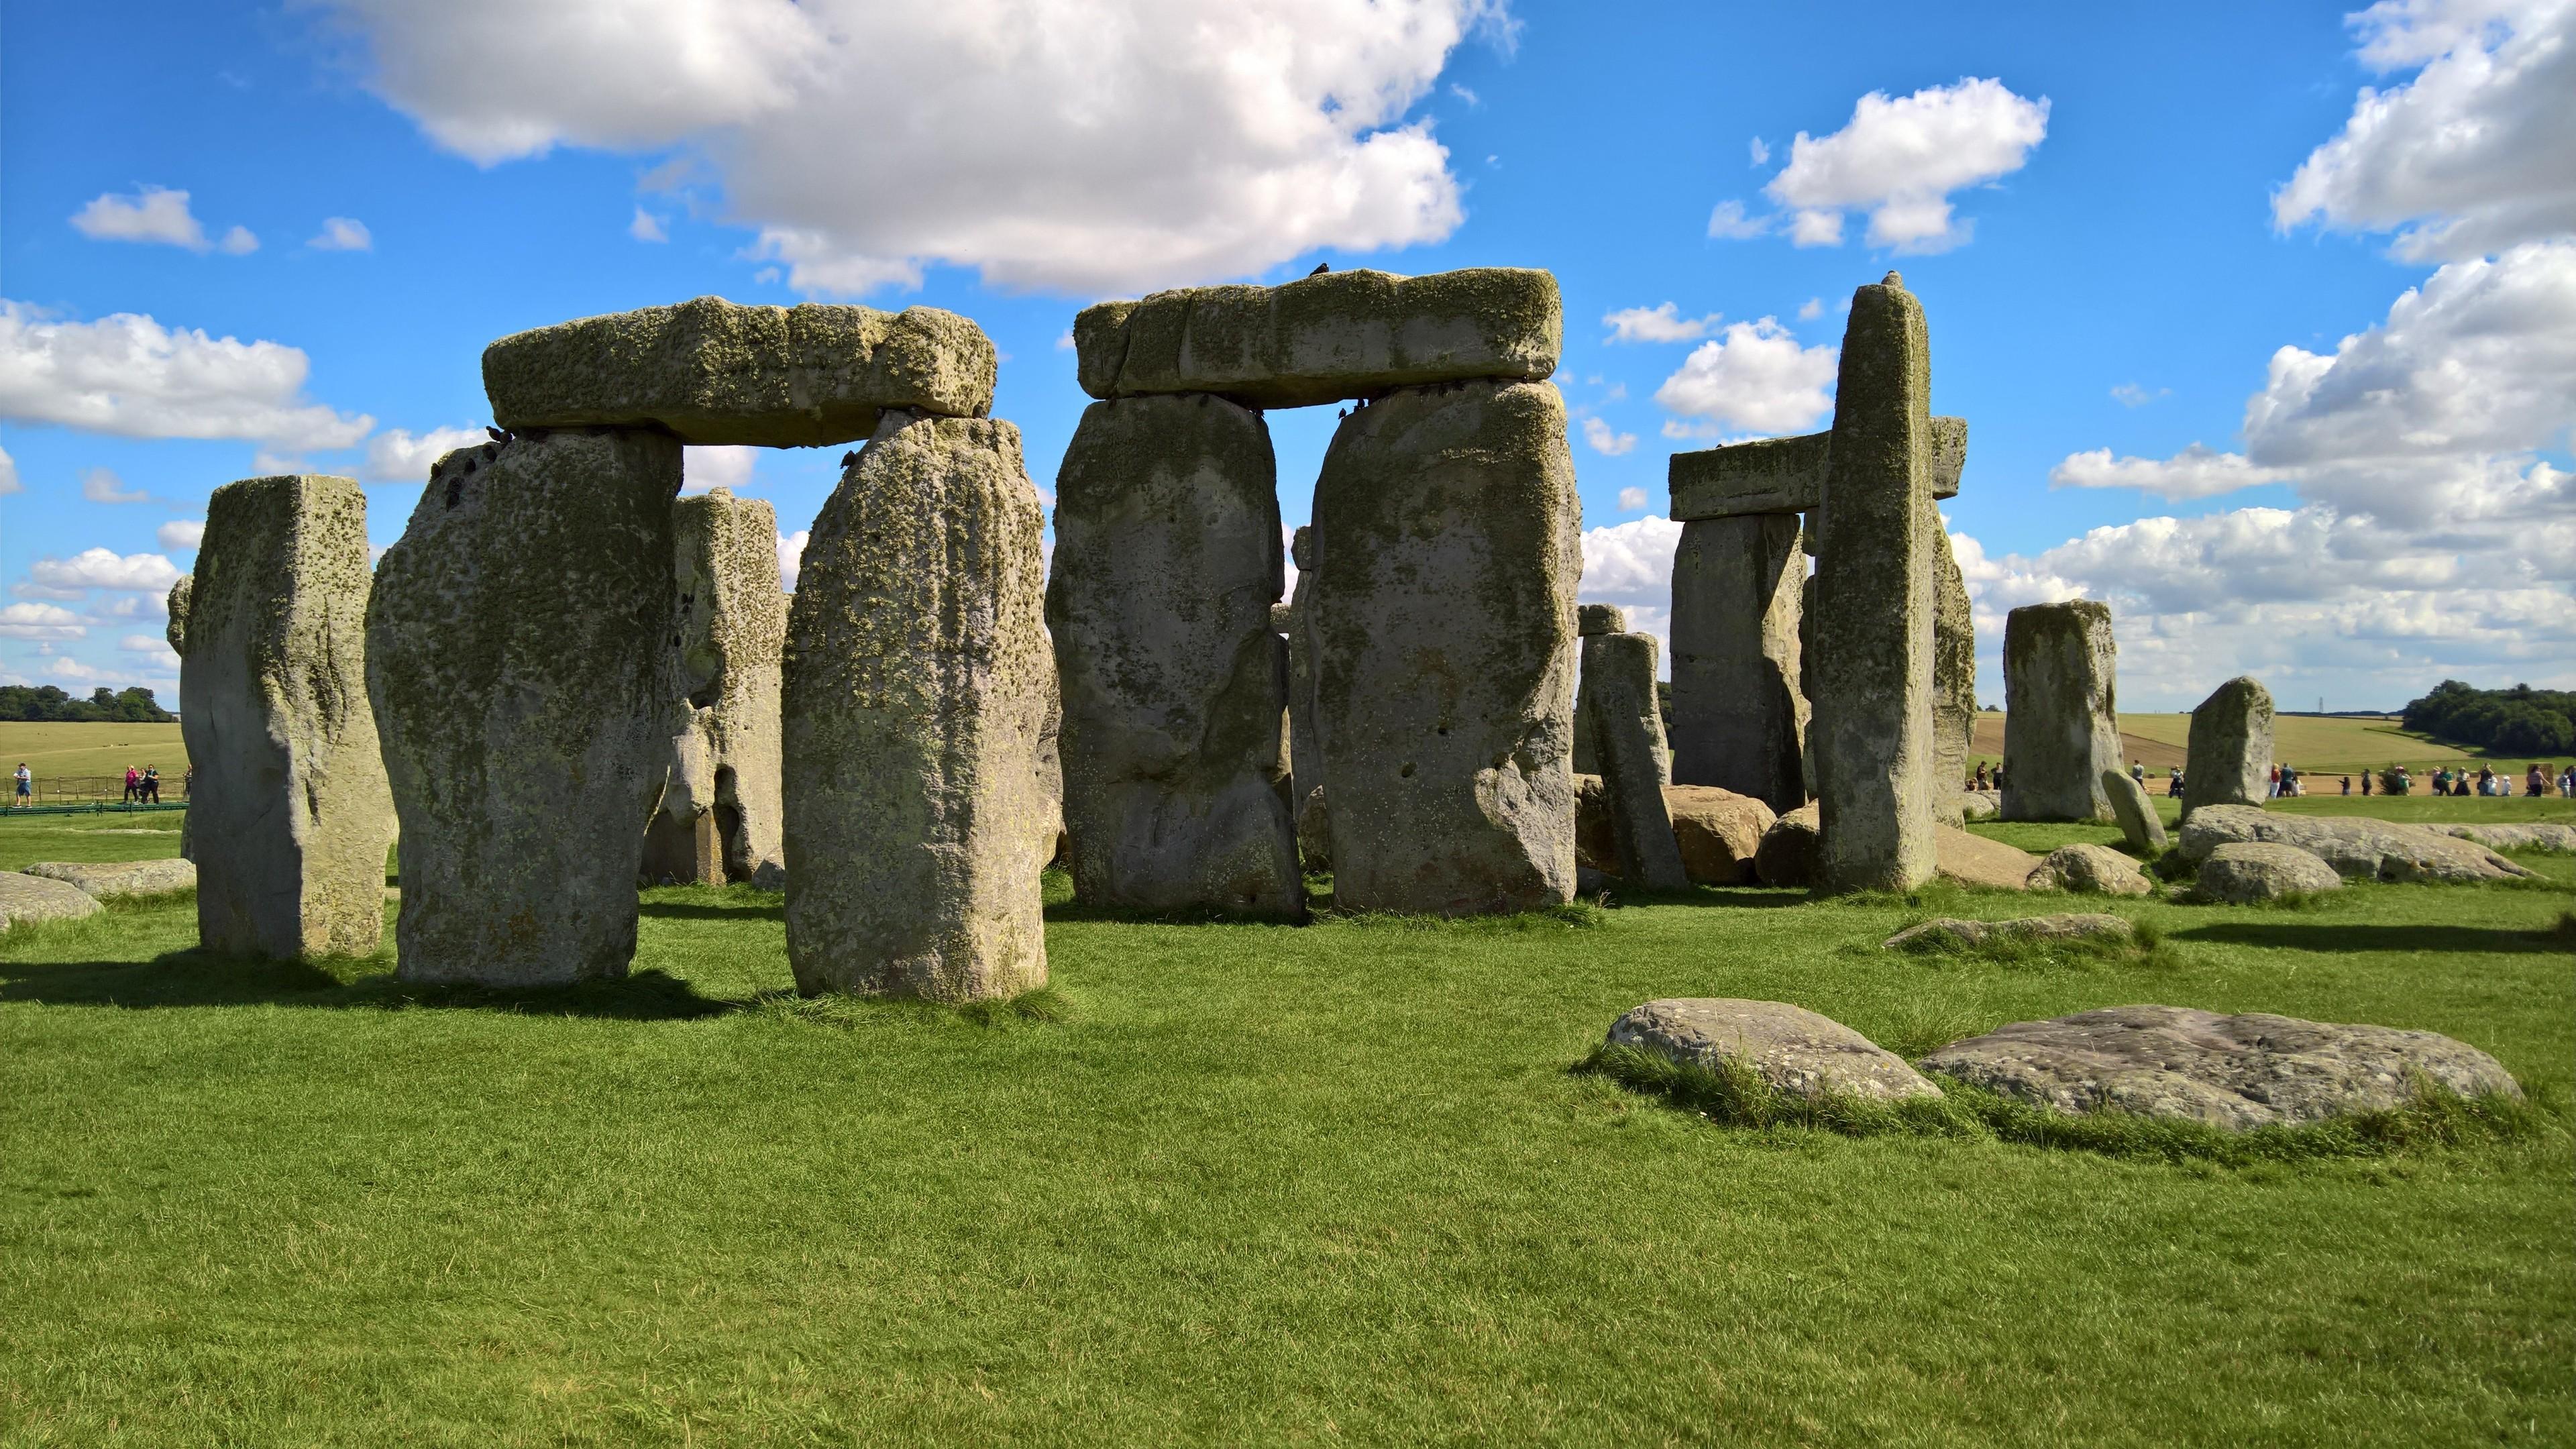 The ancient Stonehenge wallpaper